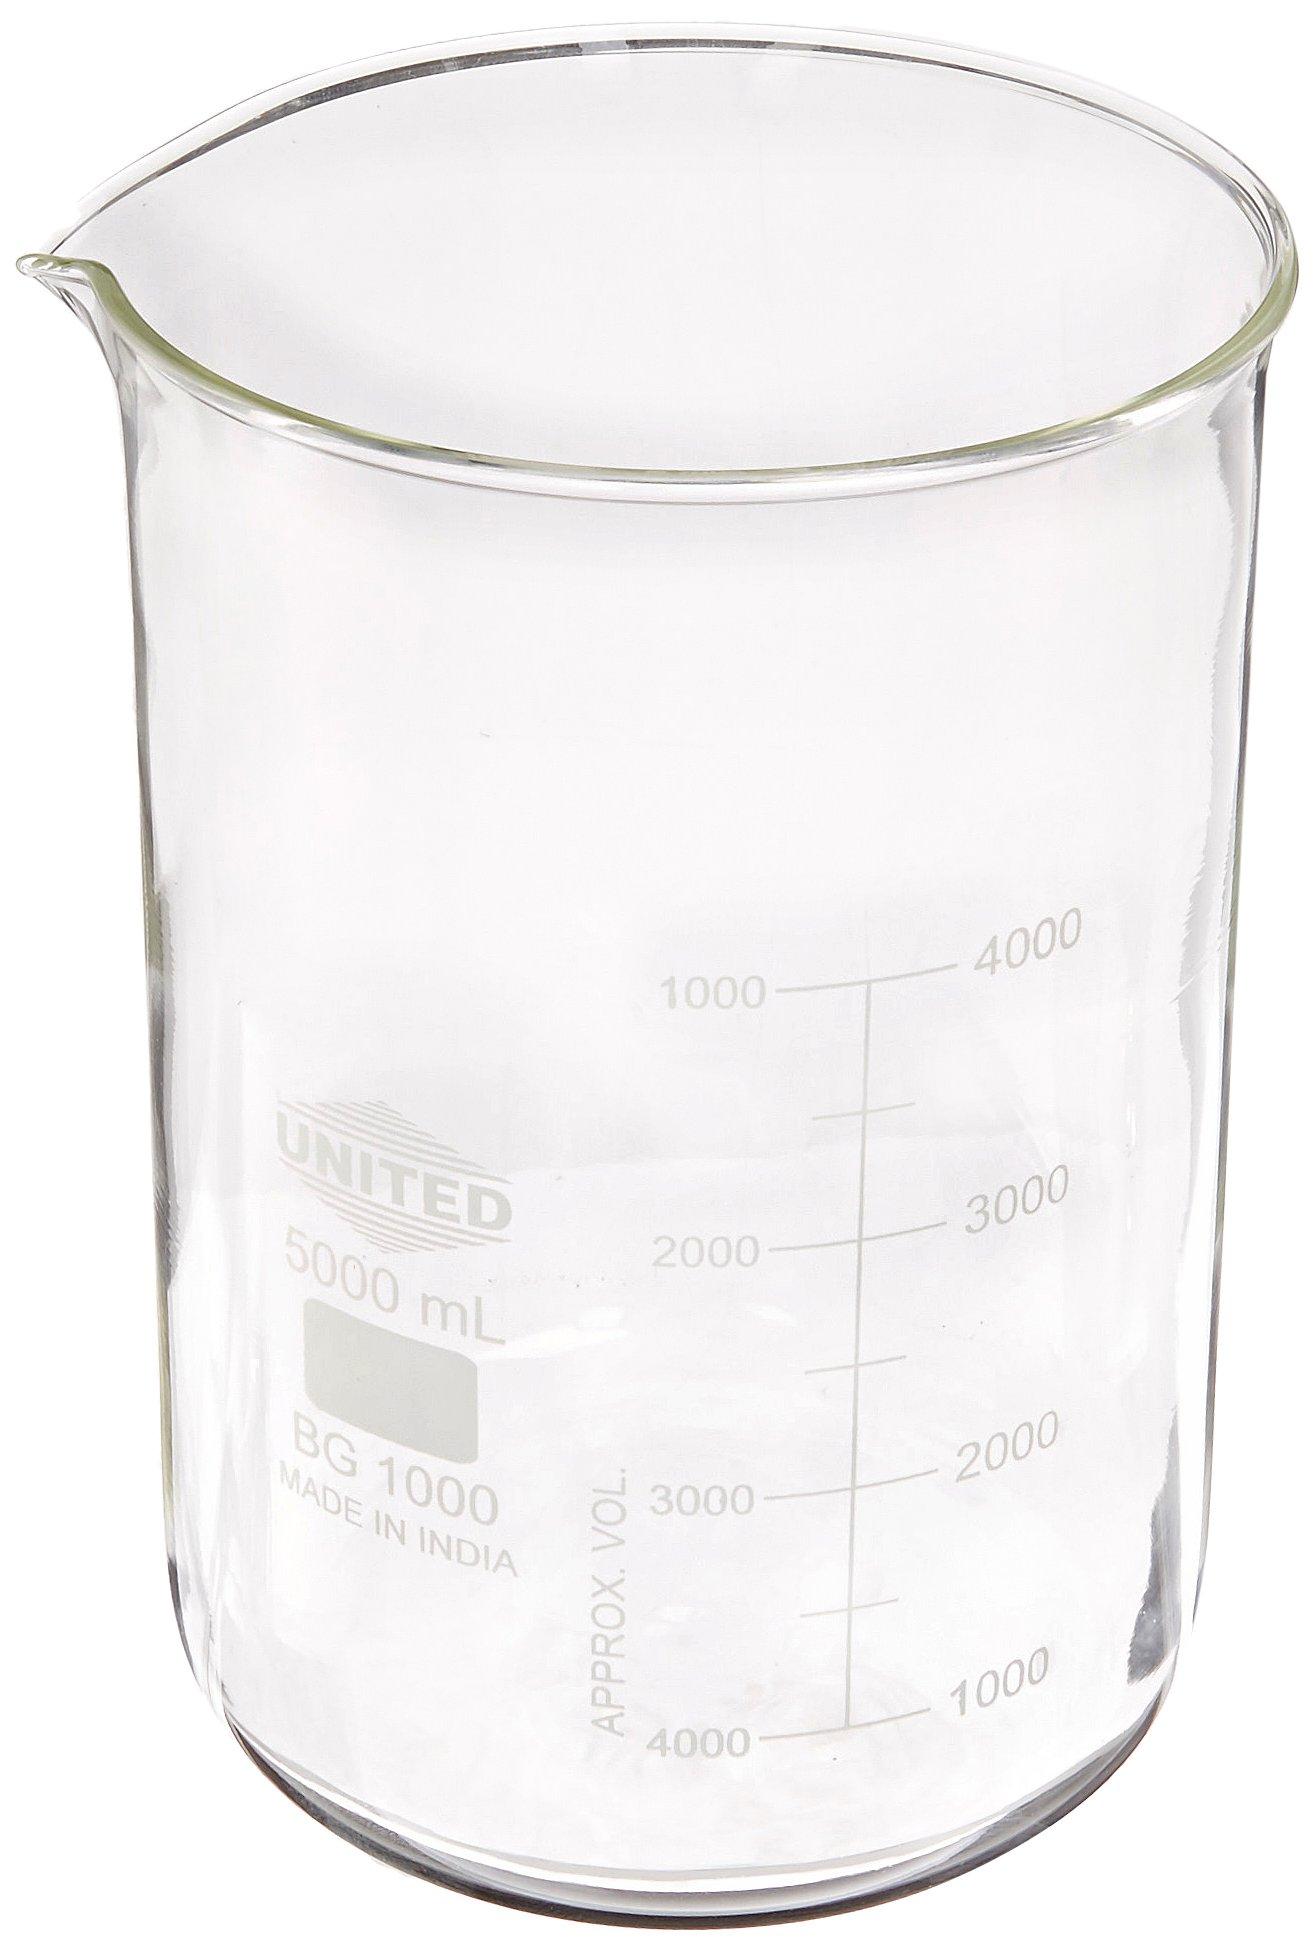 United Scientific BG1000-5000 Borosilicate Glass Low Form Beaker, 5000ml Capacity